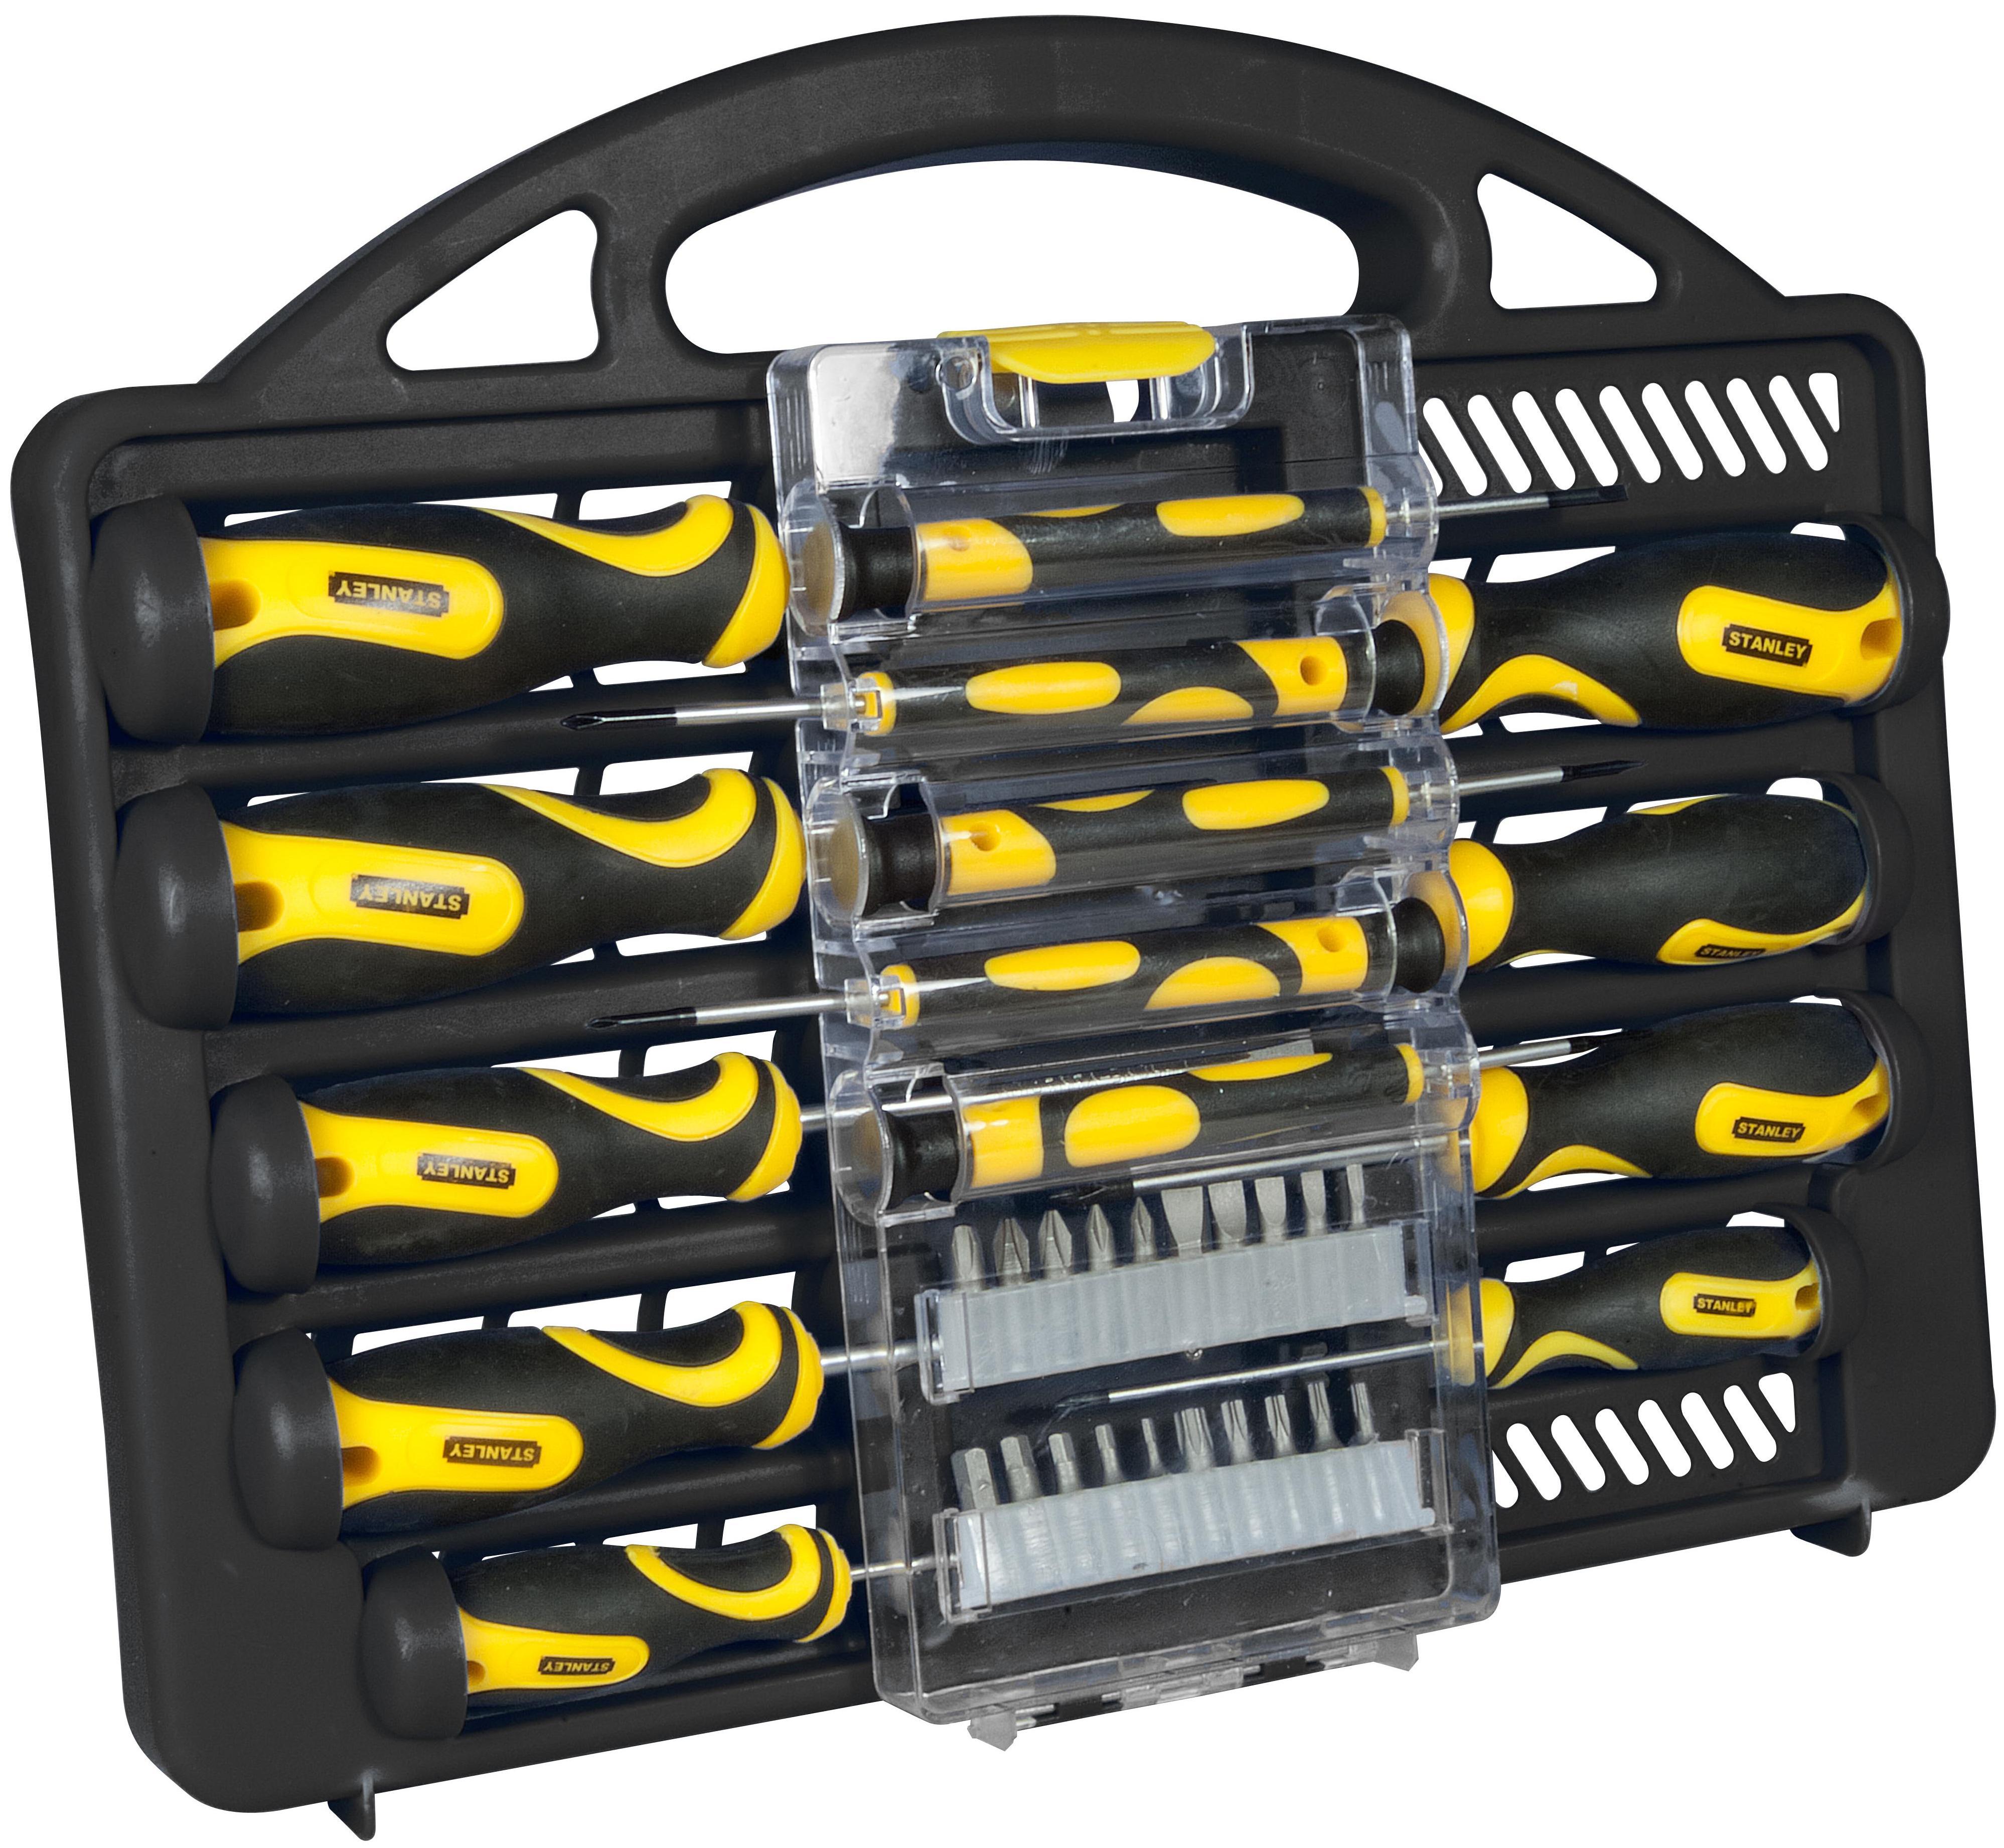 stanley screwdriver set 34 piece magnetic slotted phillips hex torx pozidrive. Black Bedroom Furniture Sets. Home Design Ideas